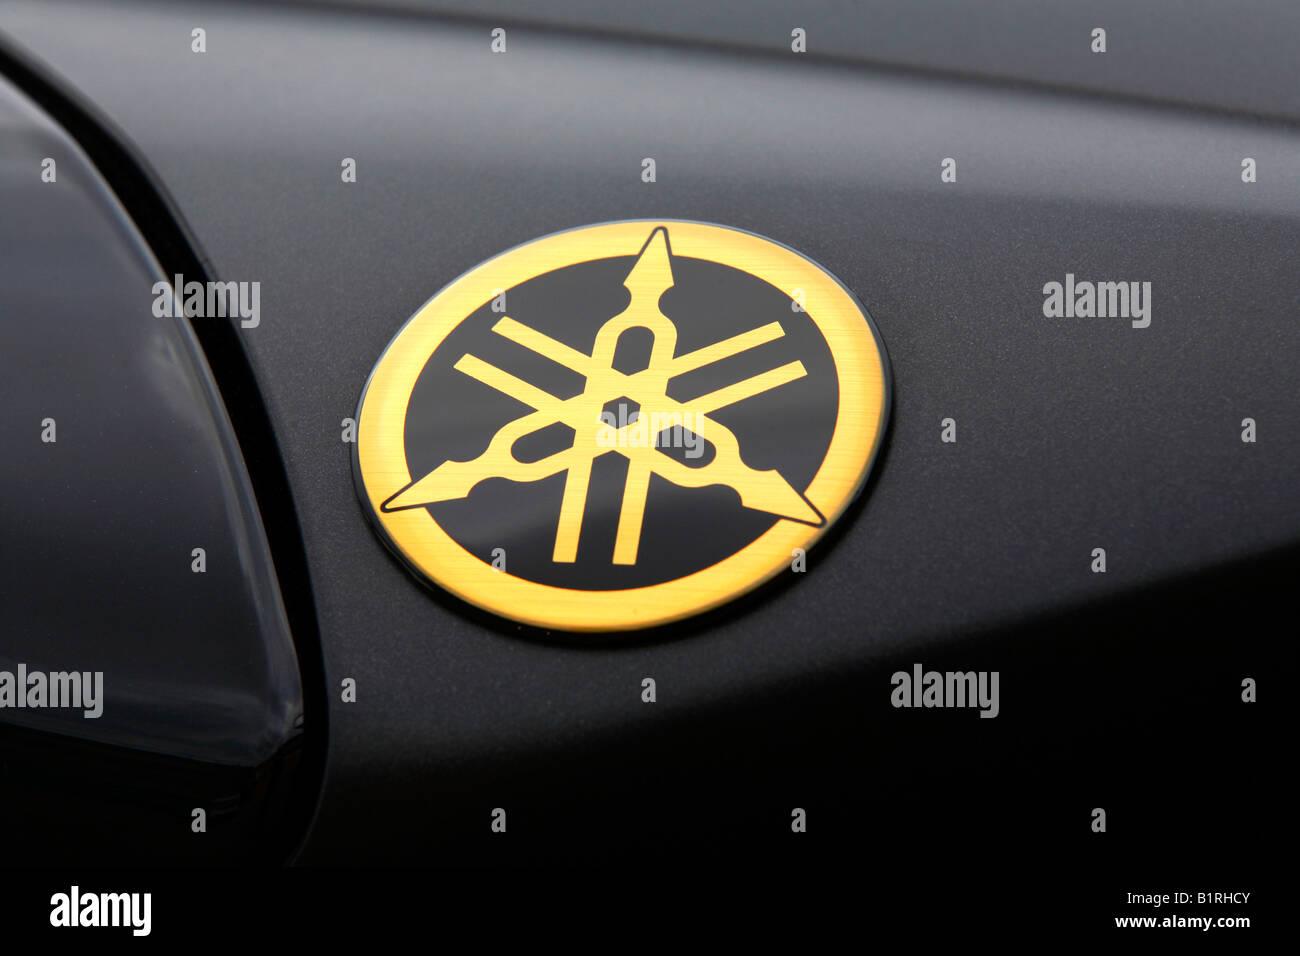 hight resolution of tank of a motorbike emblem of yamaha